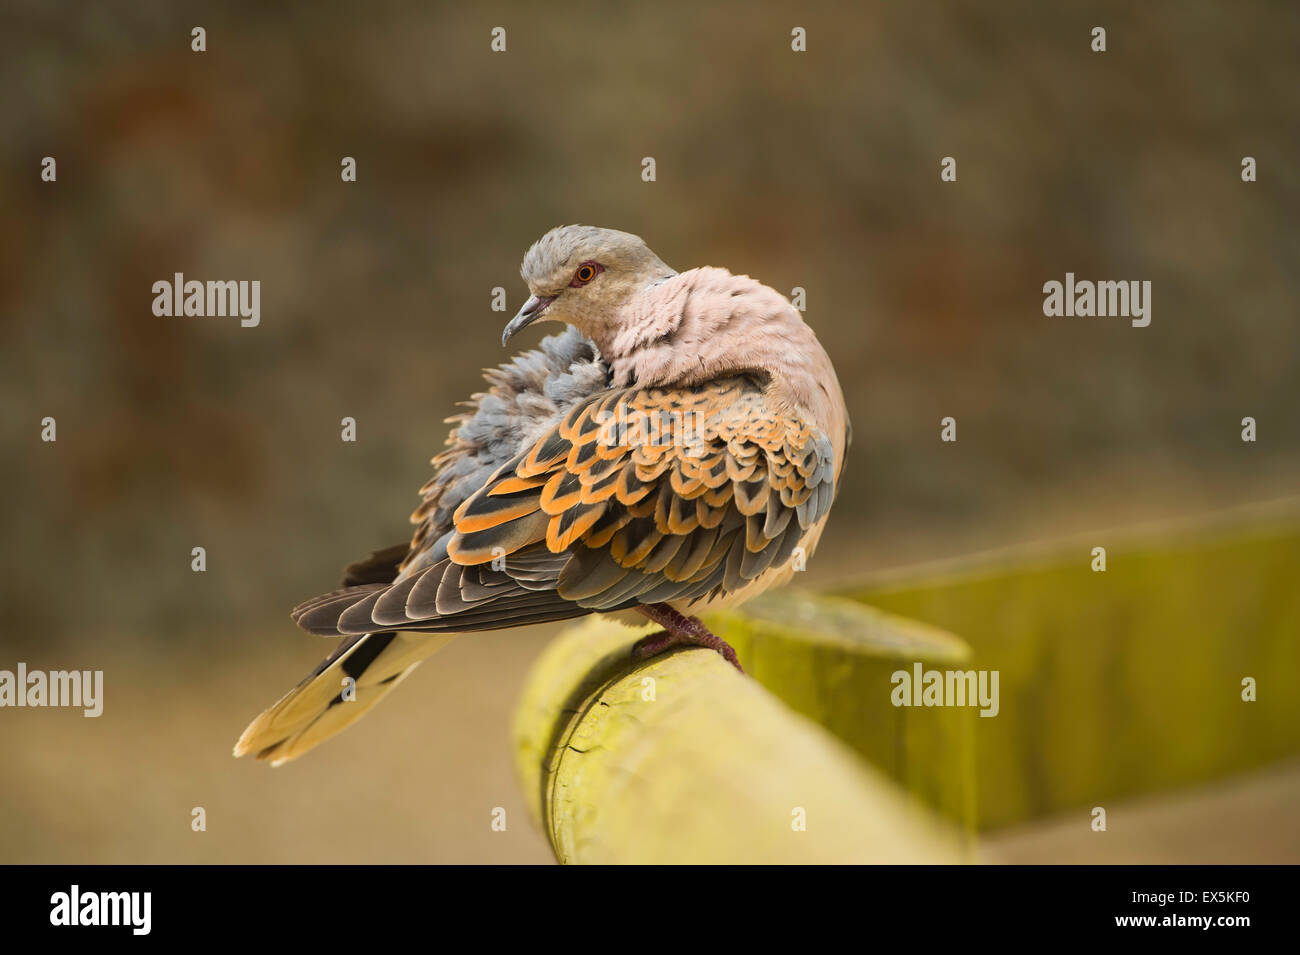 Captive Turtle Dove. - Stock Image